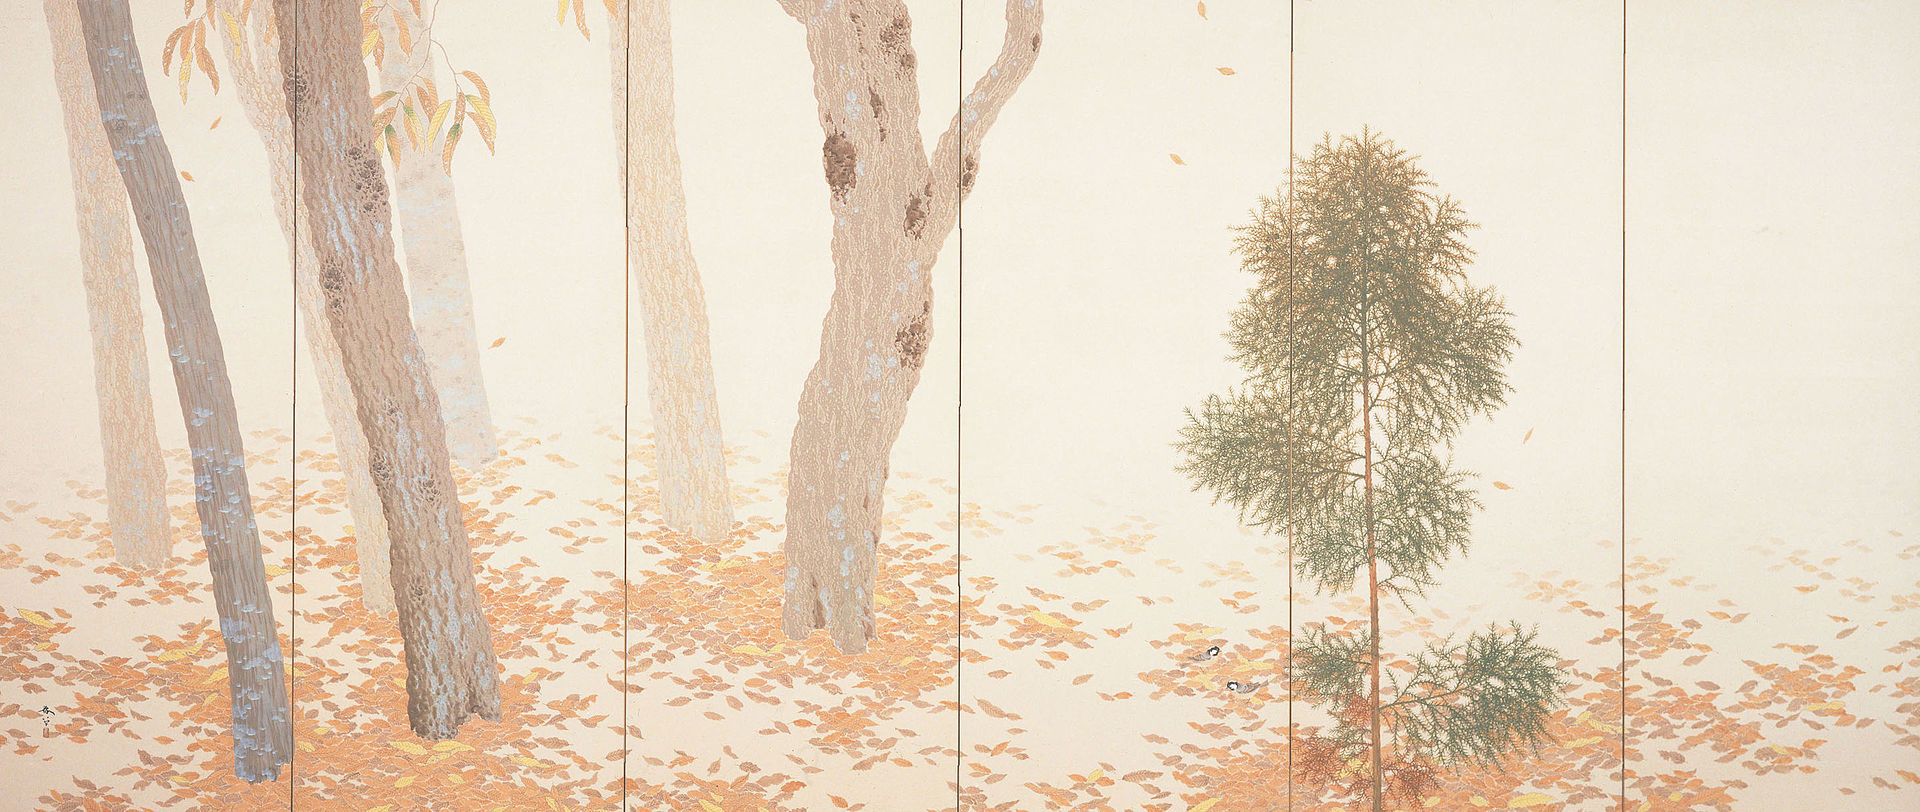 Хишида Шунсо Hishida Shunsō (1874-1911) Листопад